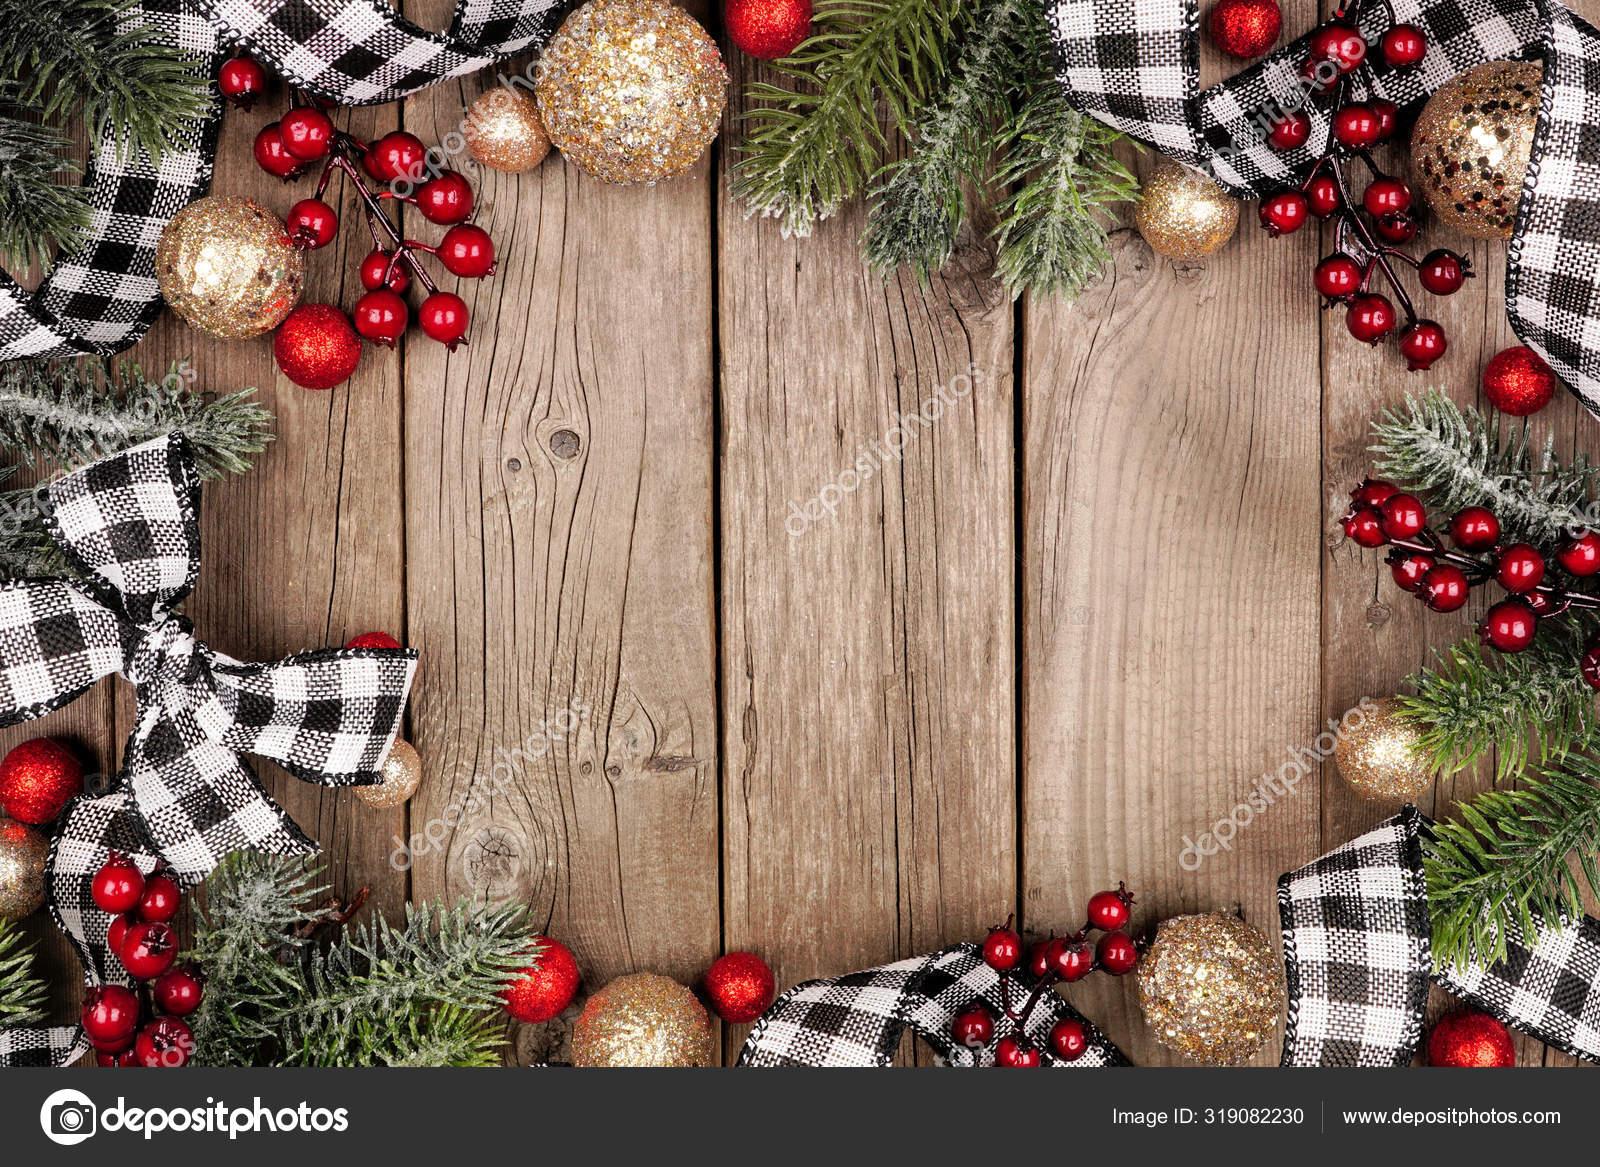 Christmas Frame White Black Checked Buffalo Plaid Ribbon Baubles Tree Stock Photo Image By C Jenifoto 319082230